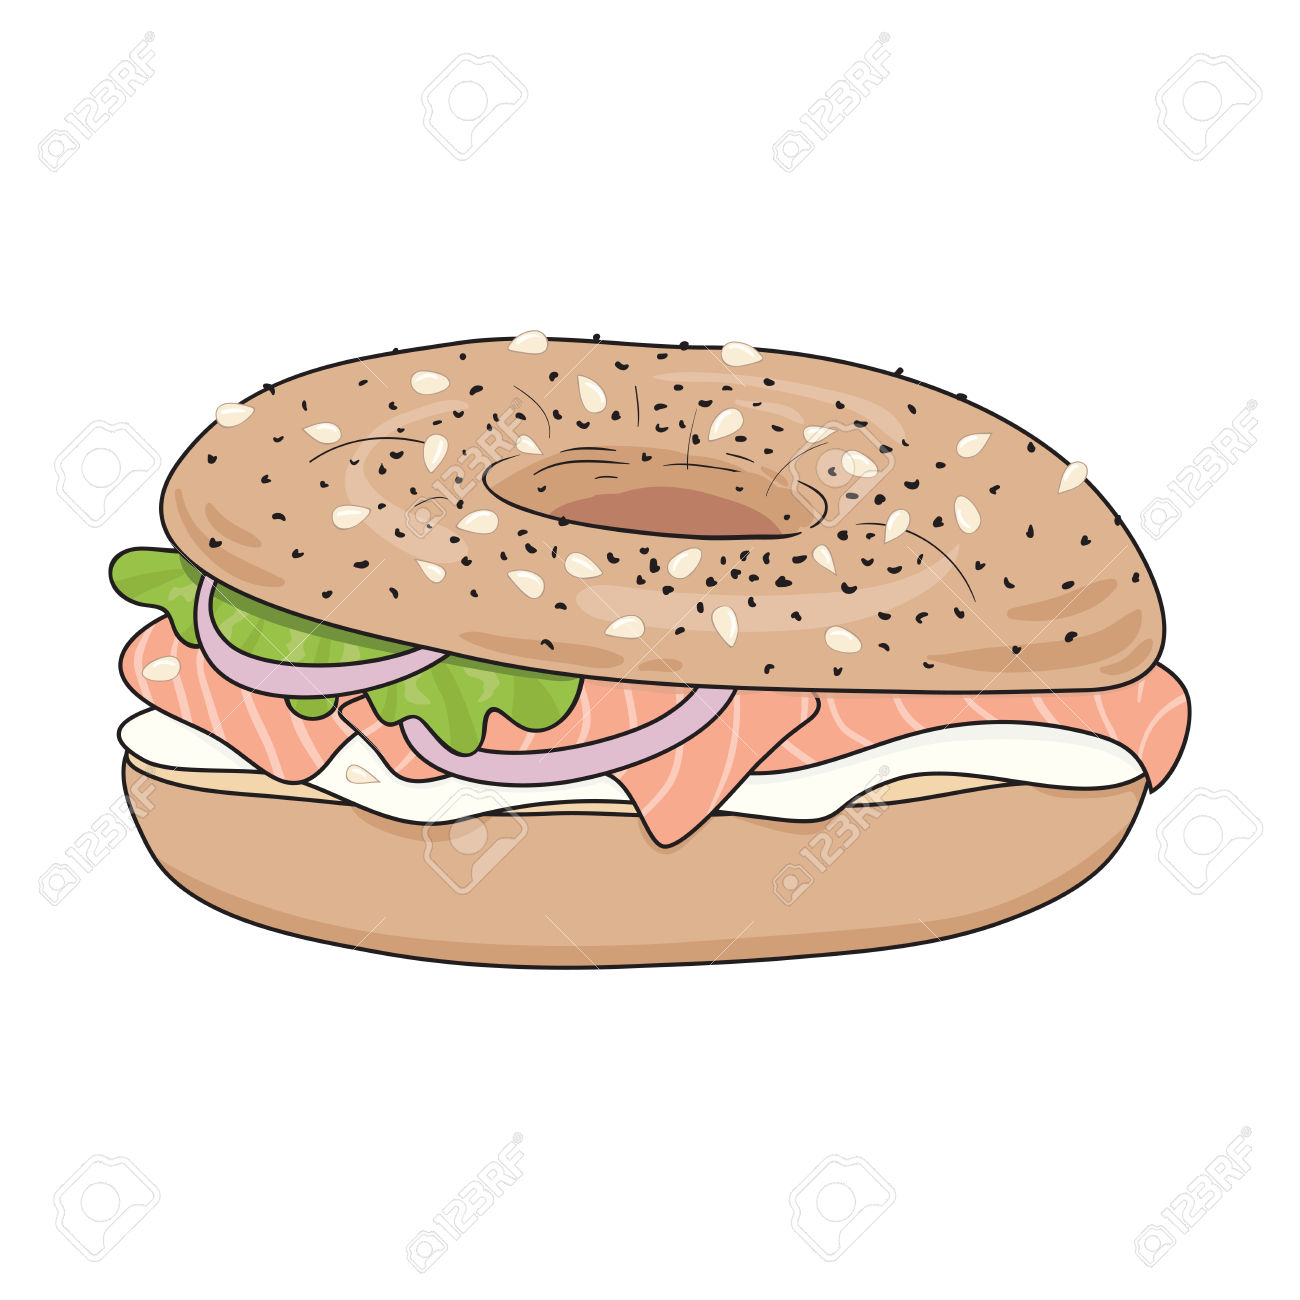 Fresh Bagel Sandwich With Cream Cheese, Salmon Fillet, Salad.